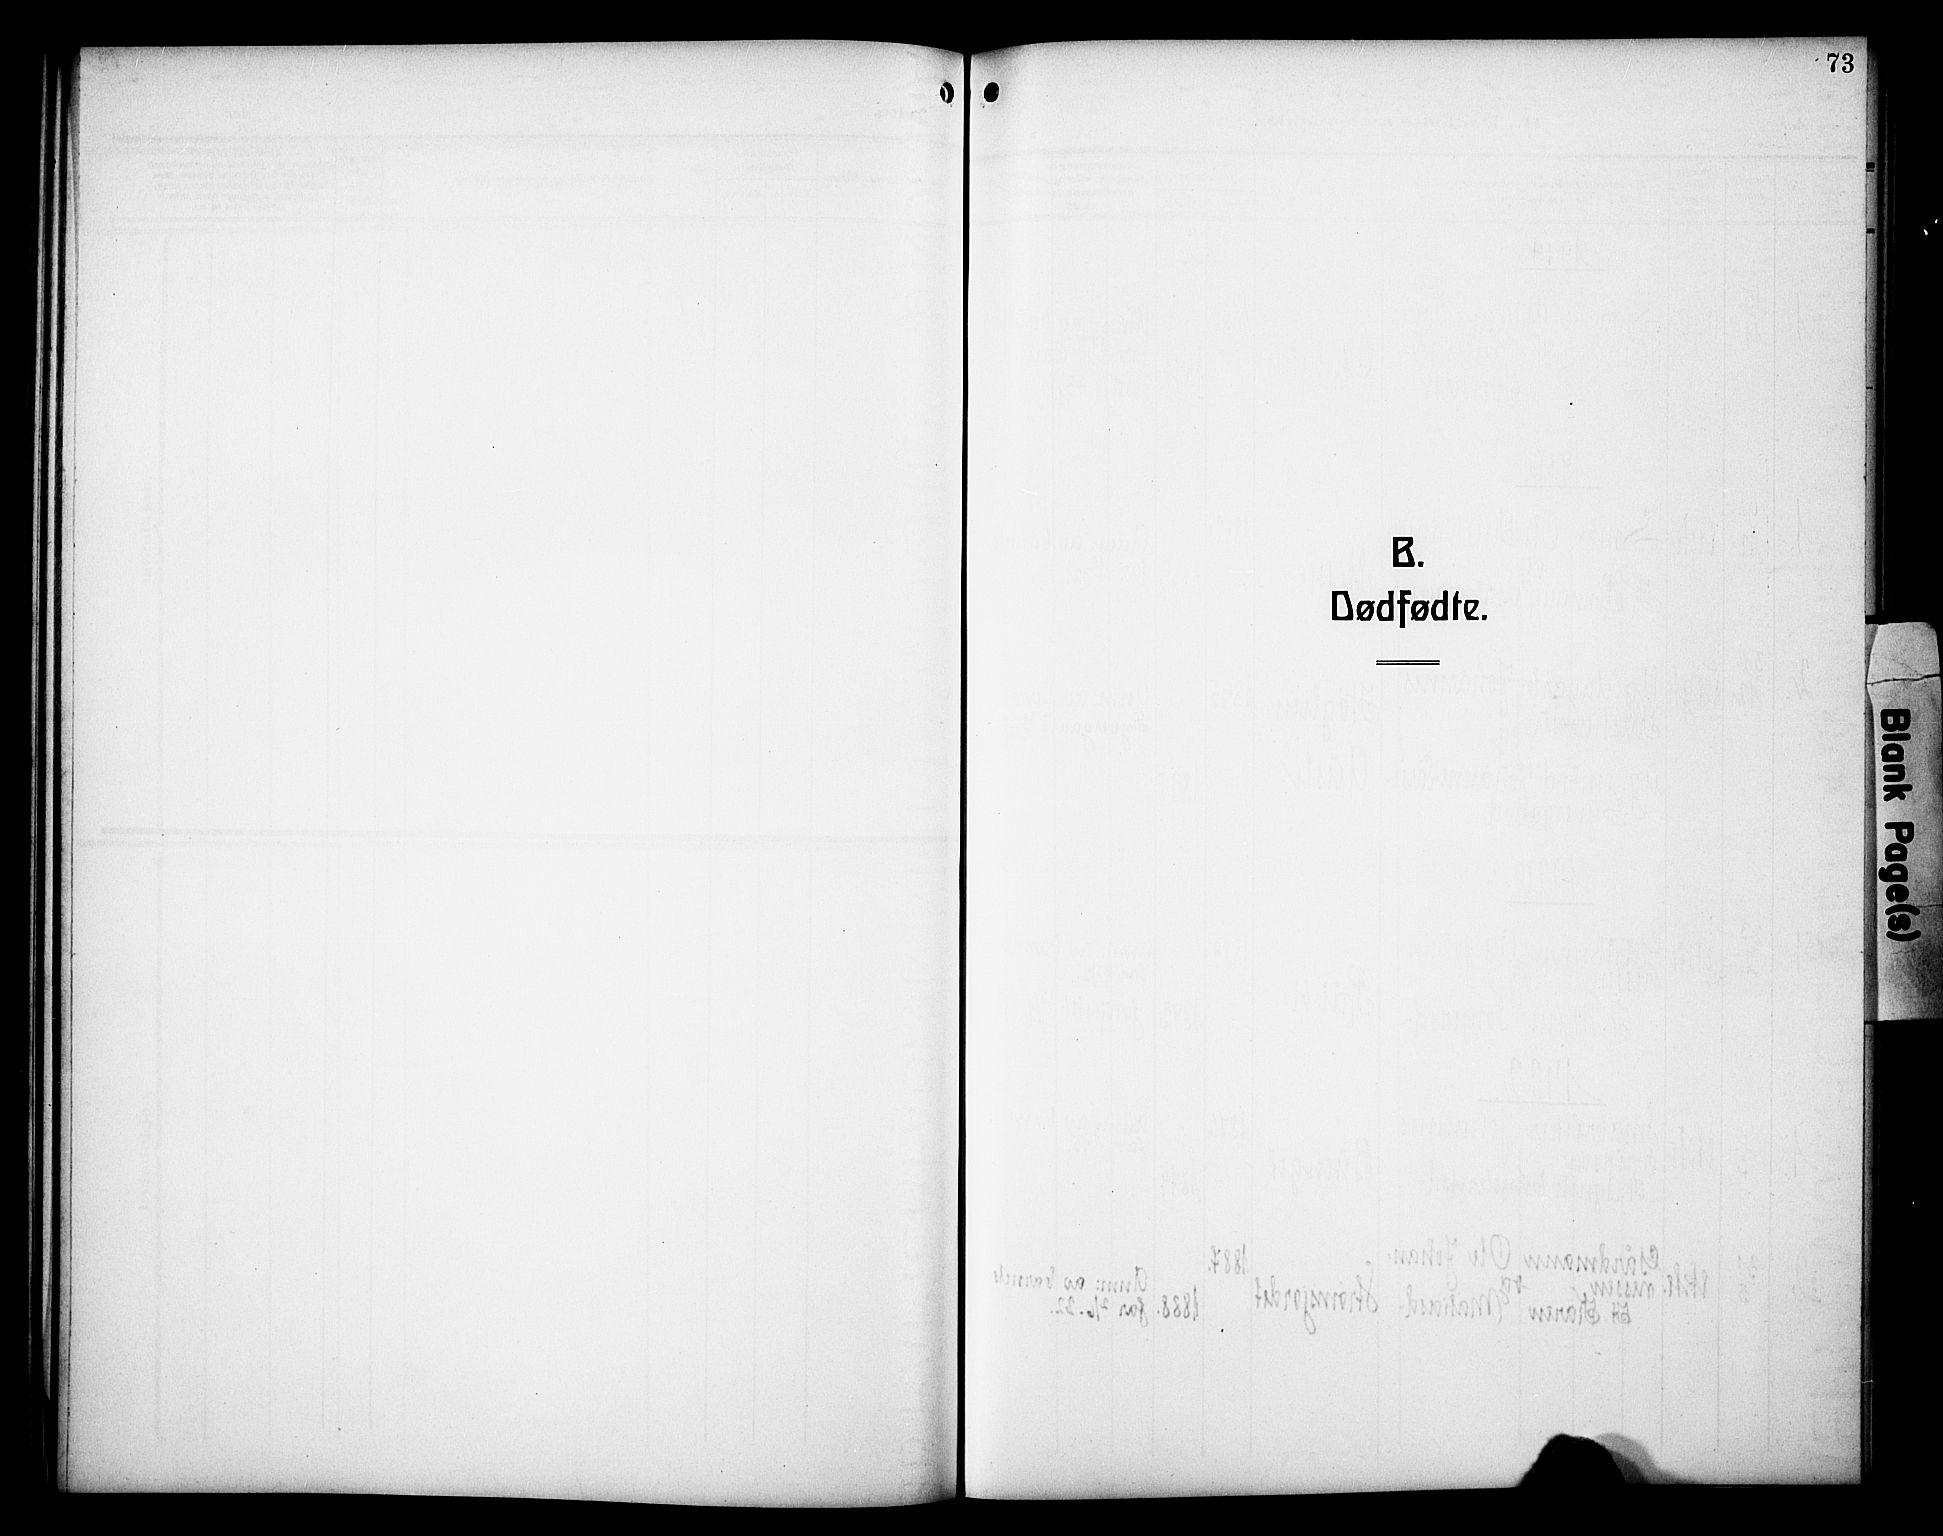 SAH, Øyer prestekontor, Klokkerbok nr. 7, 1913-1928, s. 73